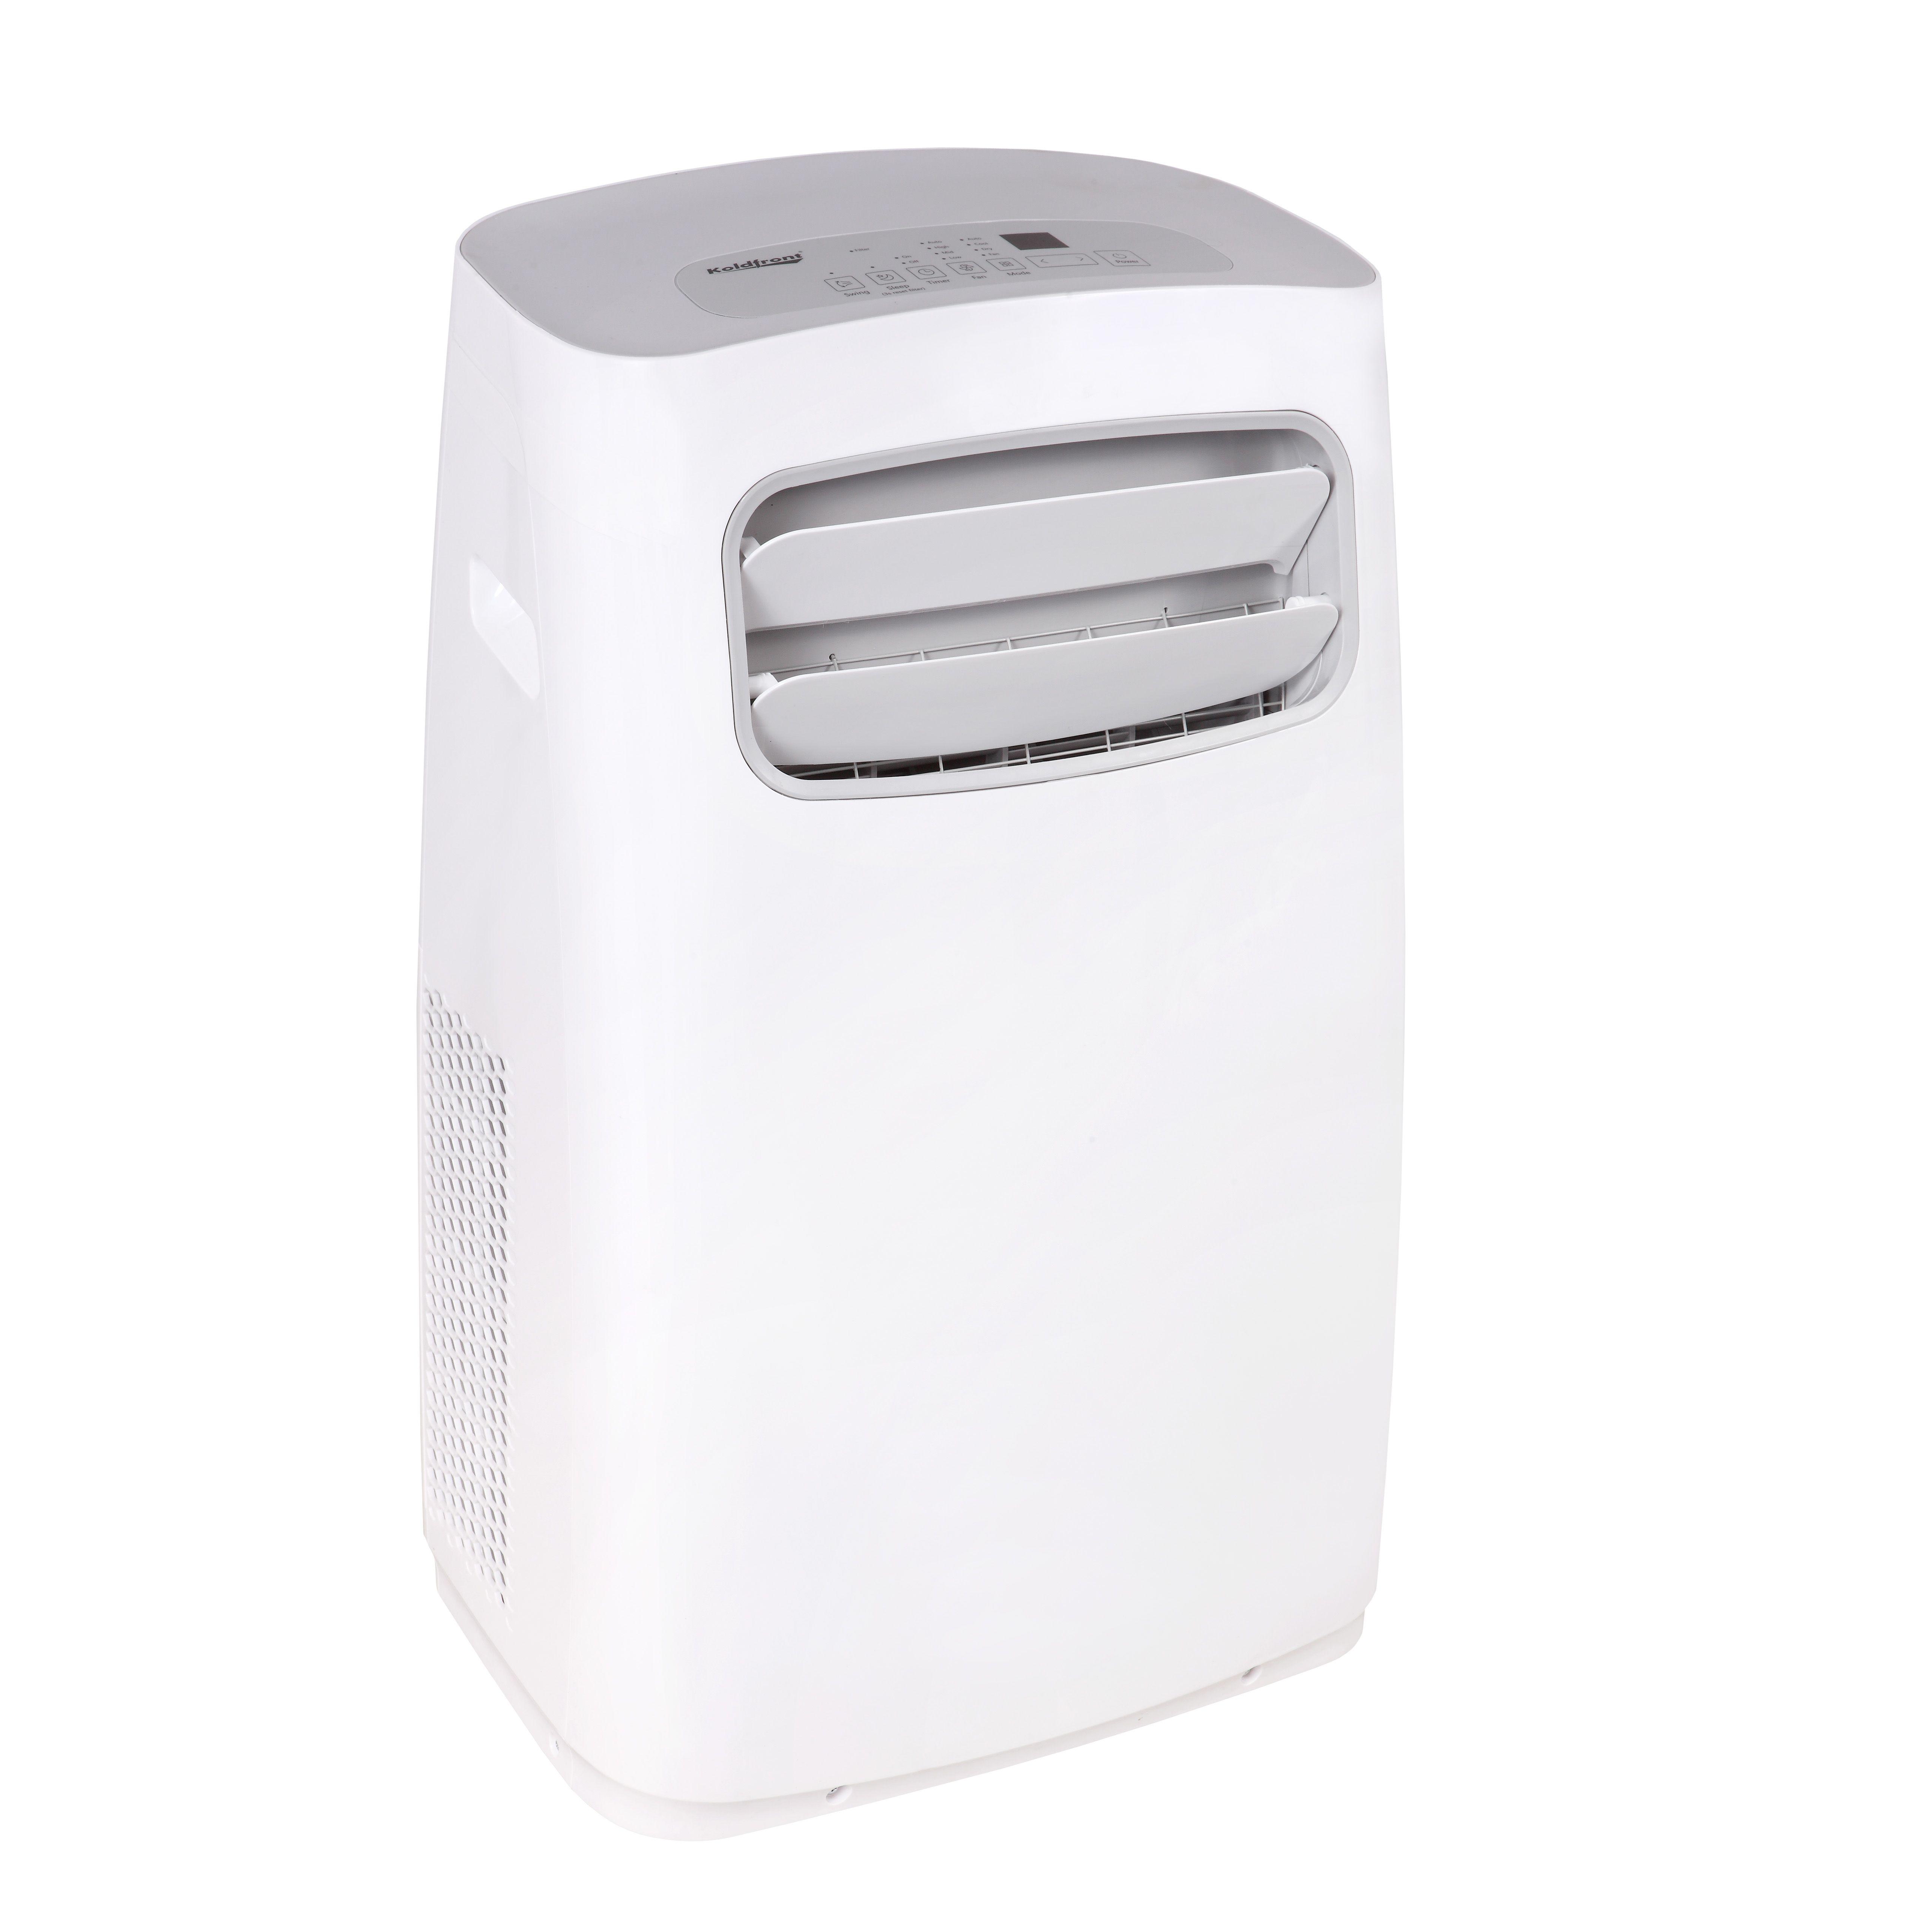 12,000 BTU Portable Air Conditioner Appliance sale